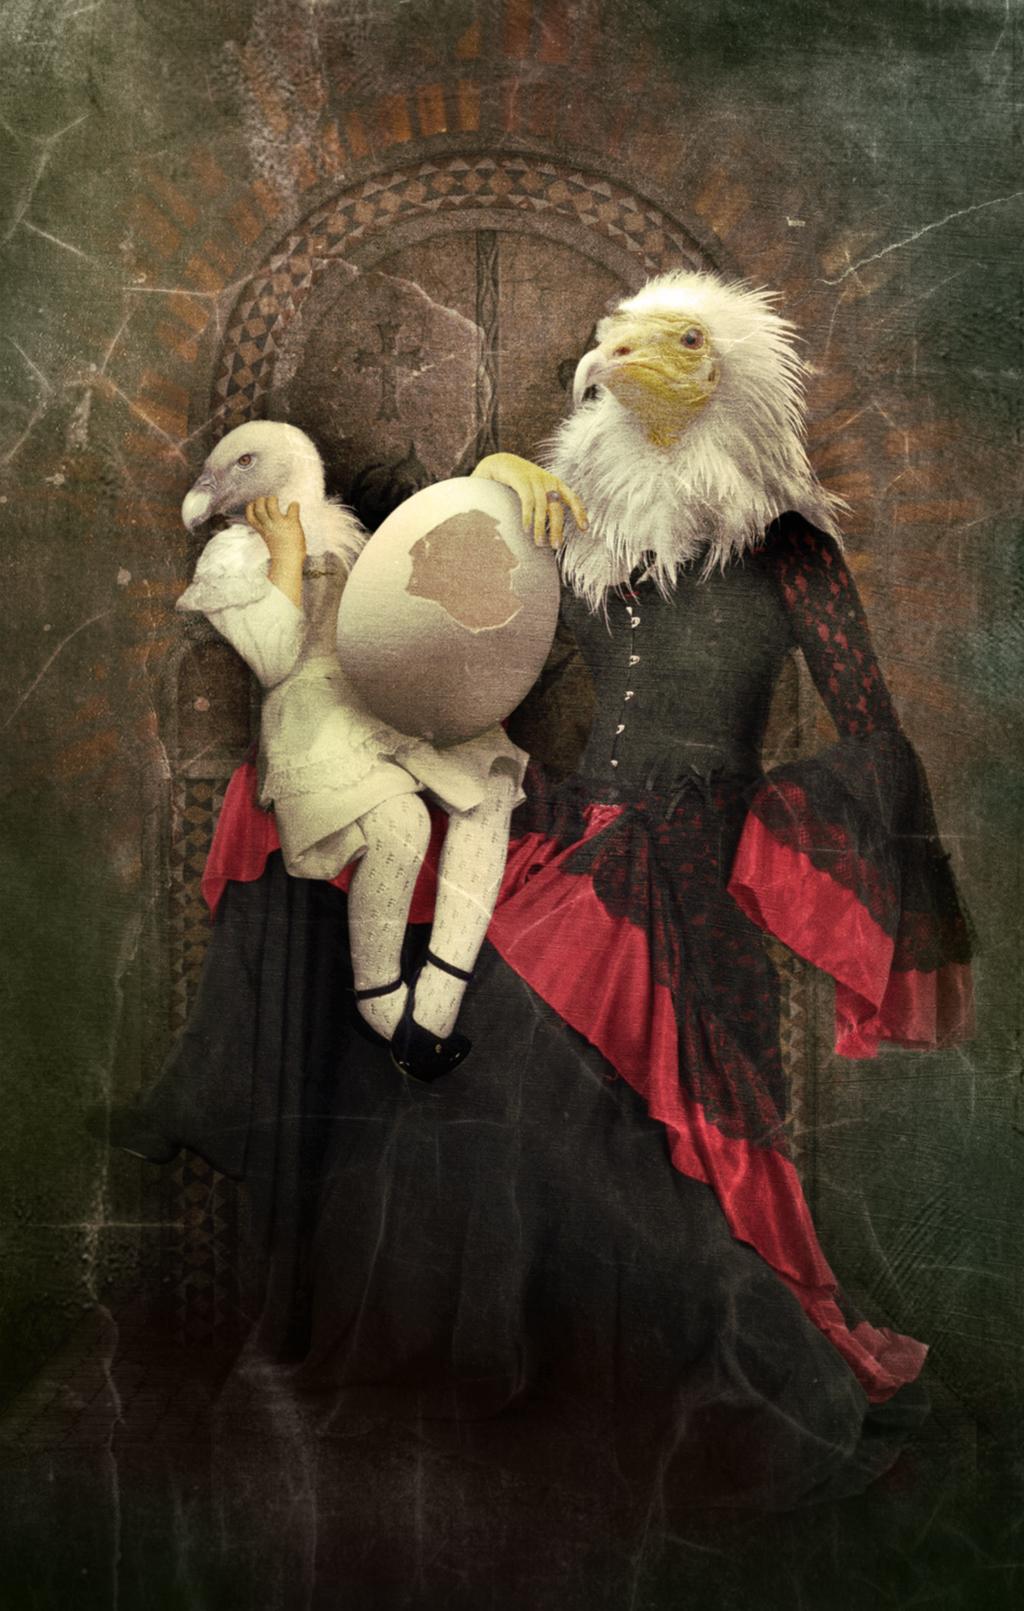 Vulture Dinasty